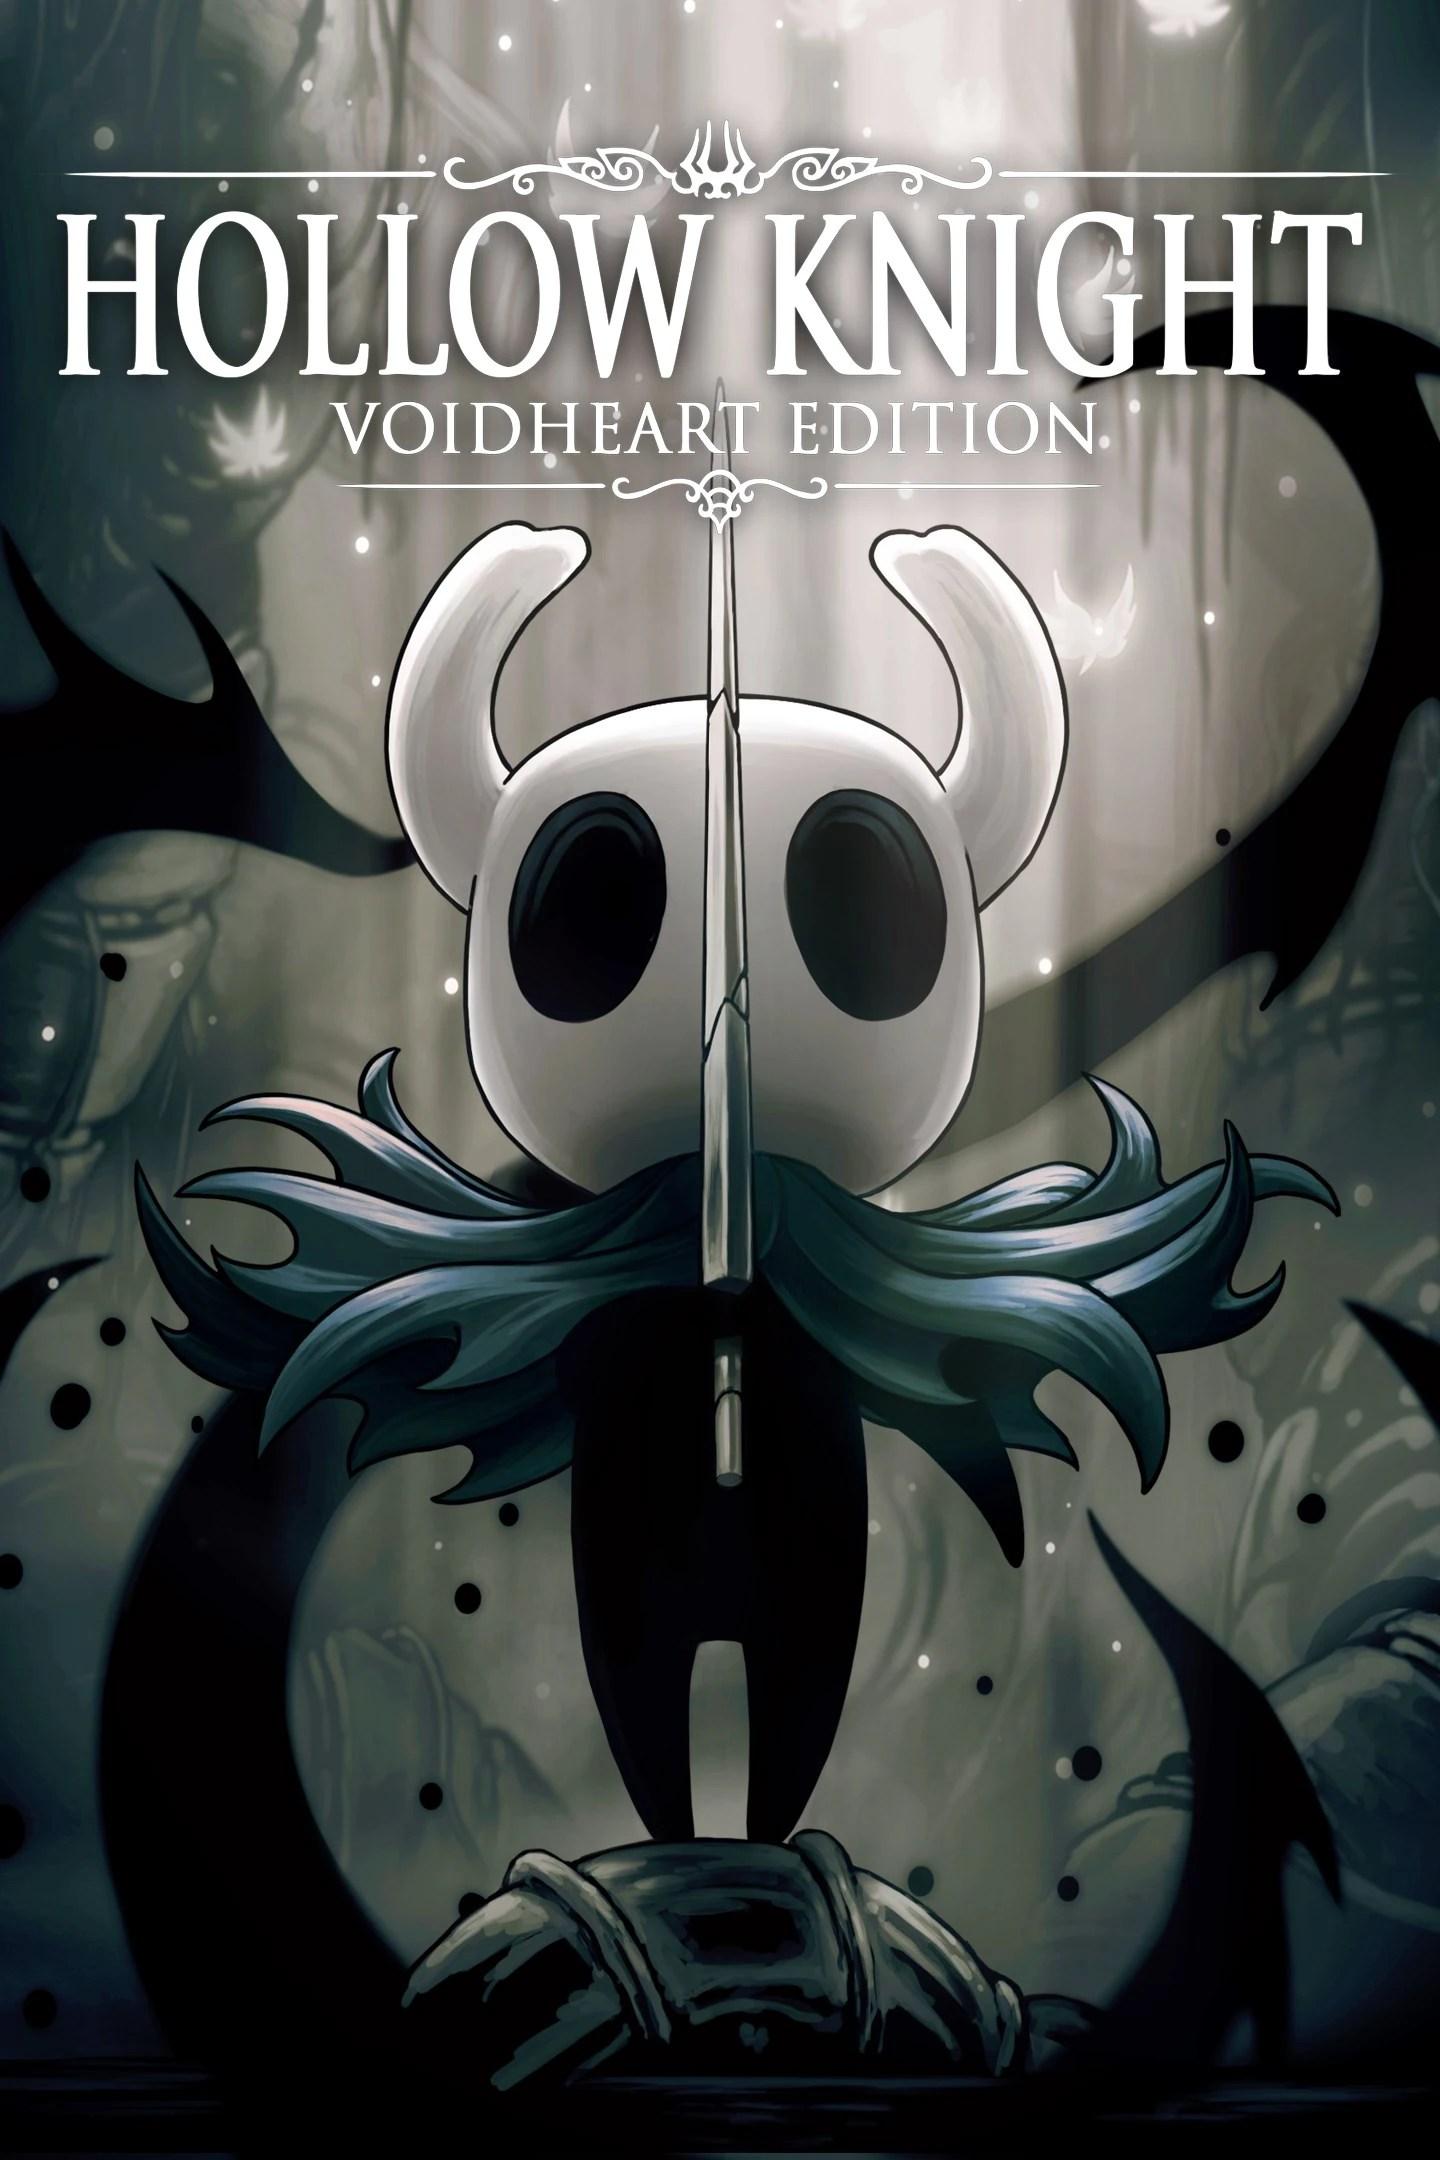 voidheart edition hollow knight wiki